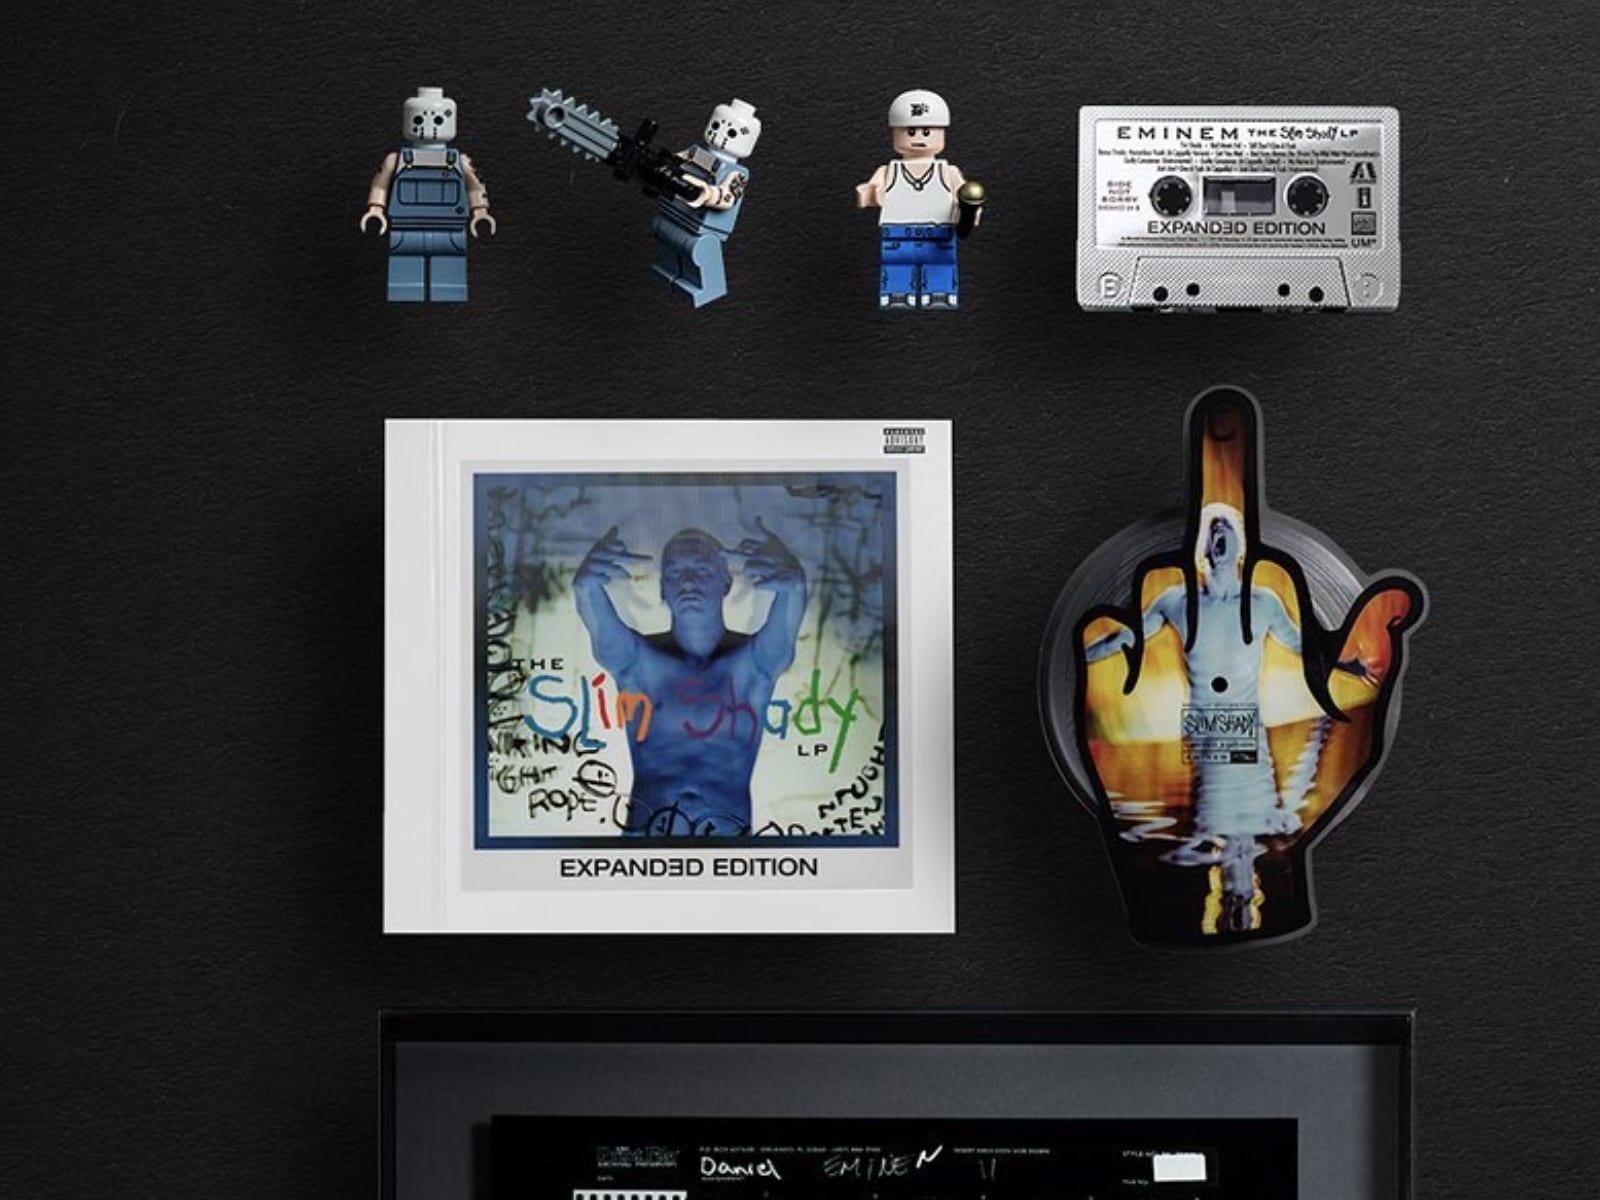 Eminem Collection Slim Shady LP 20